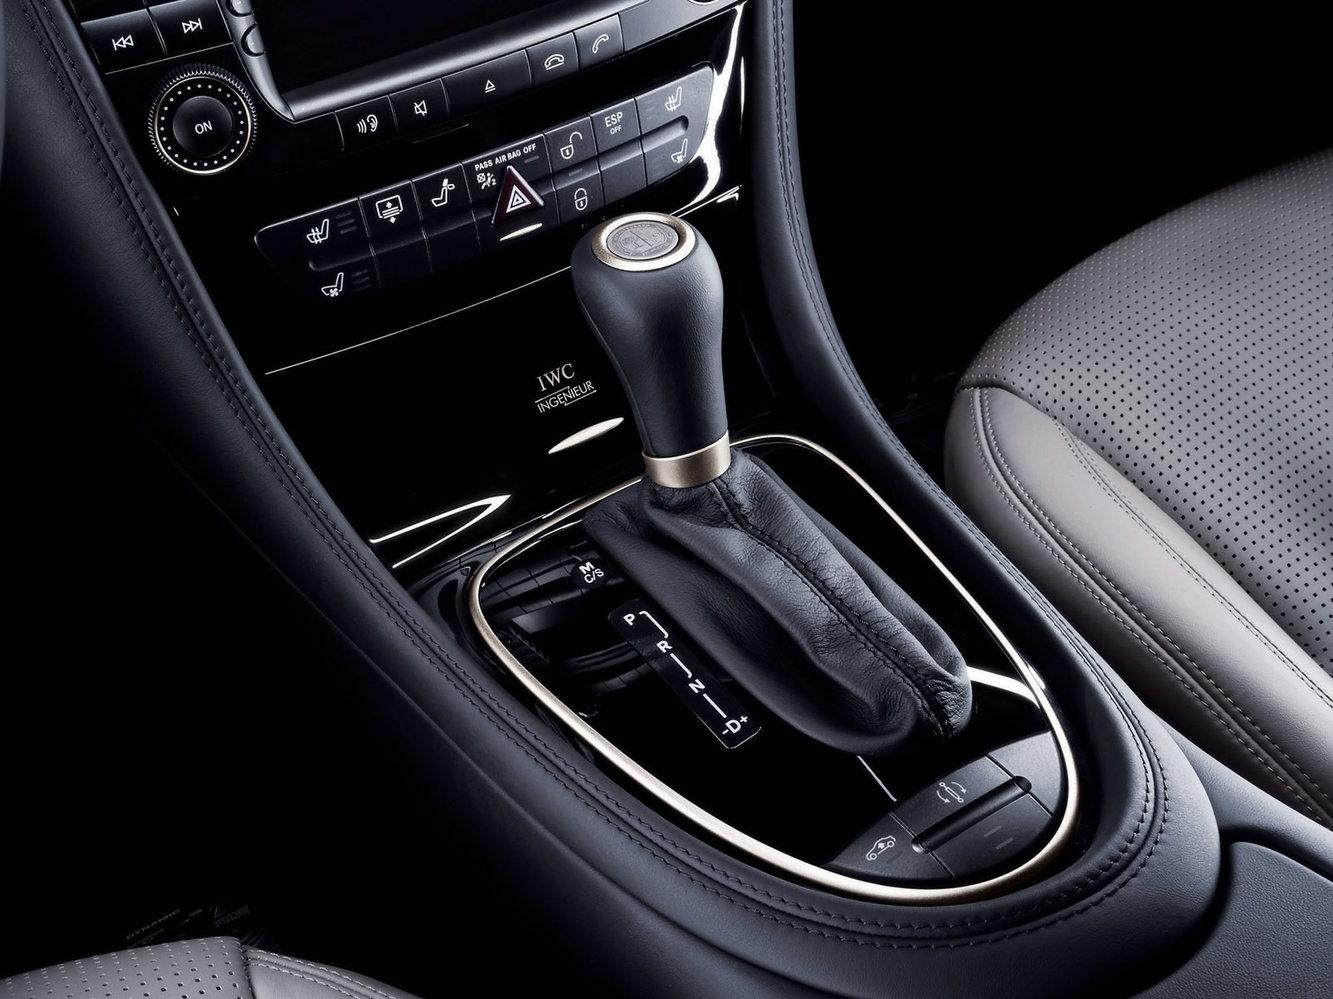 2006-Mercedes-Benz-CLS-55-AMG-IWC-Ingenieur-Shifter-1600x1200.jpg